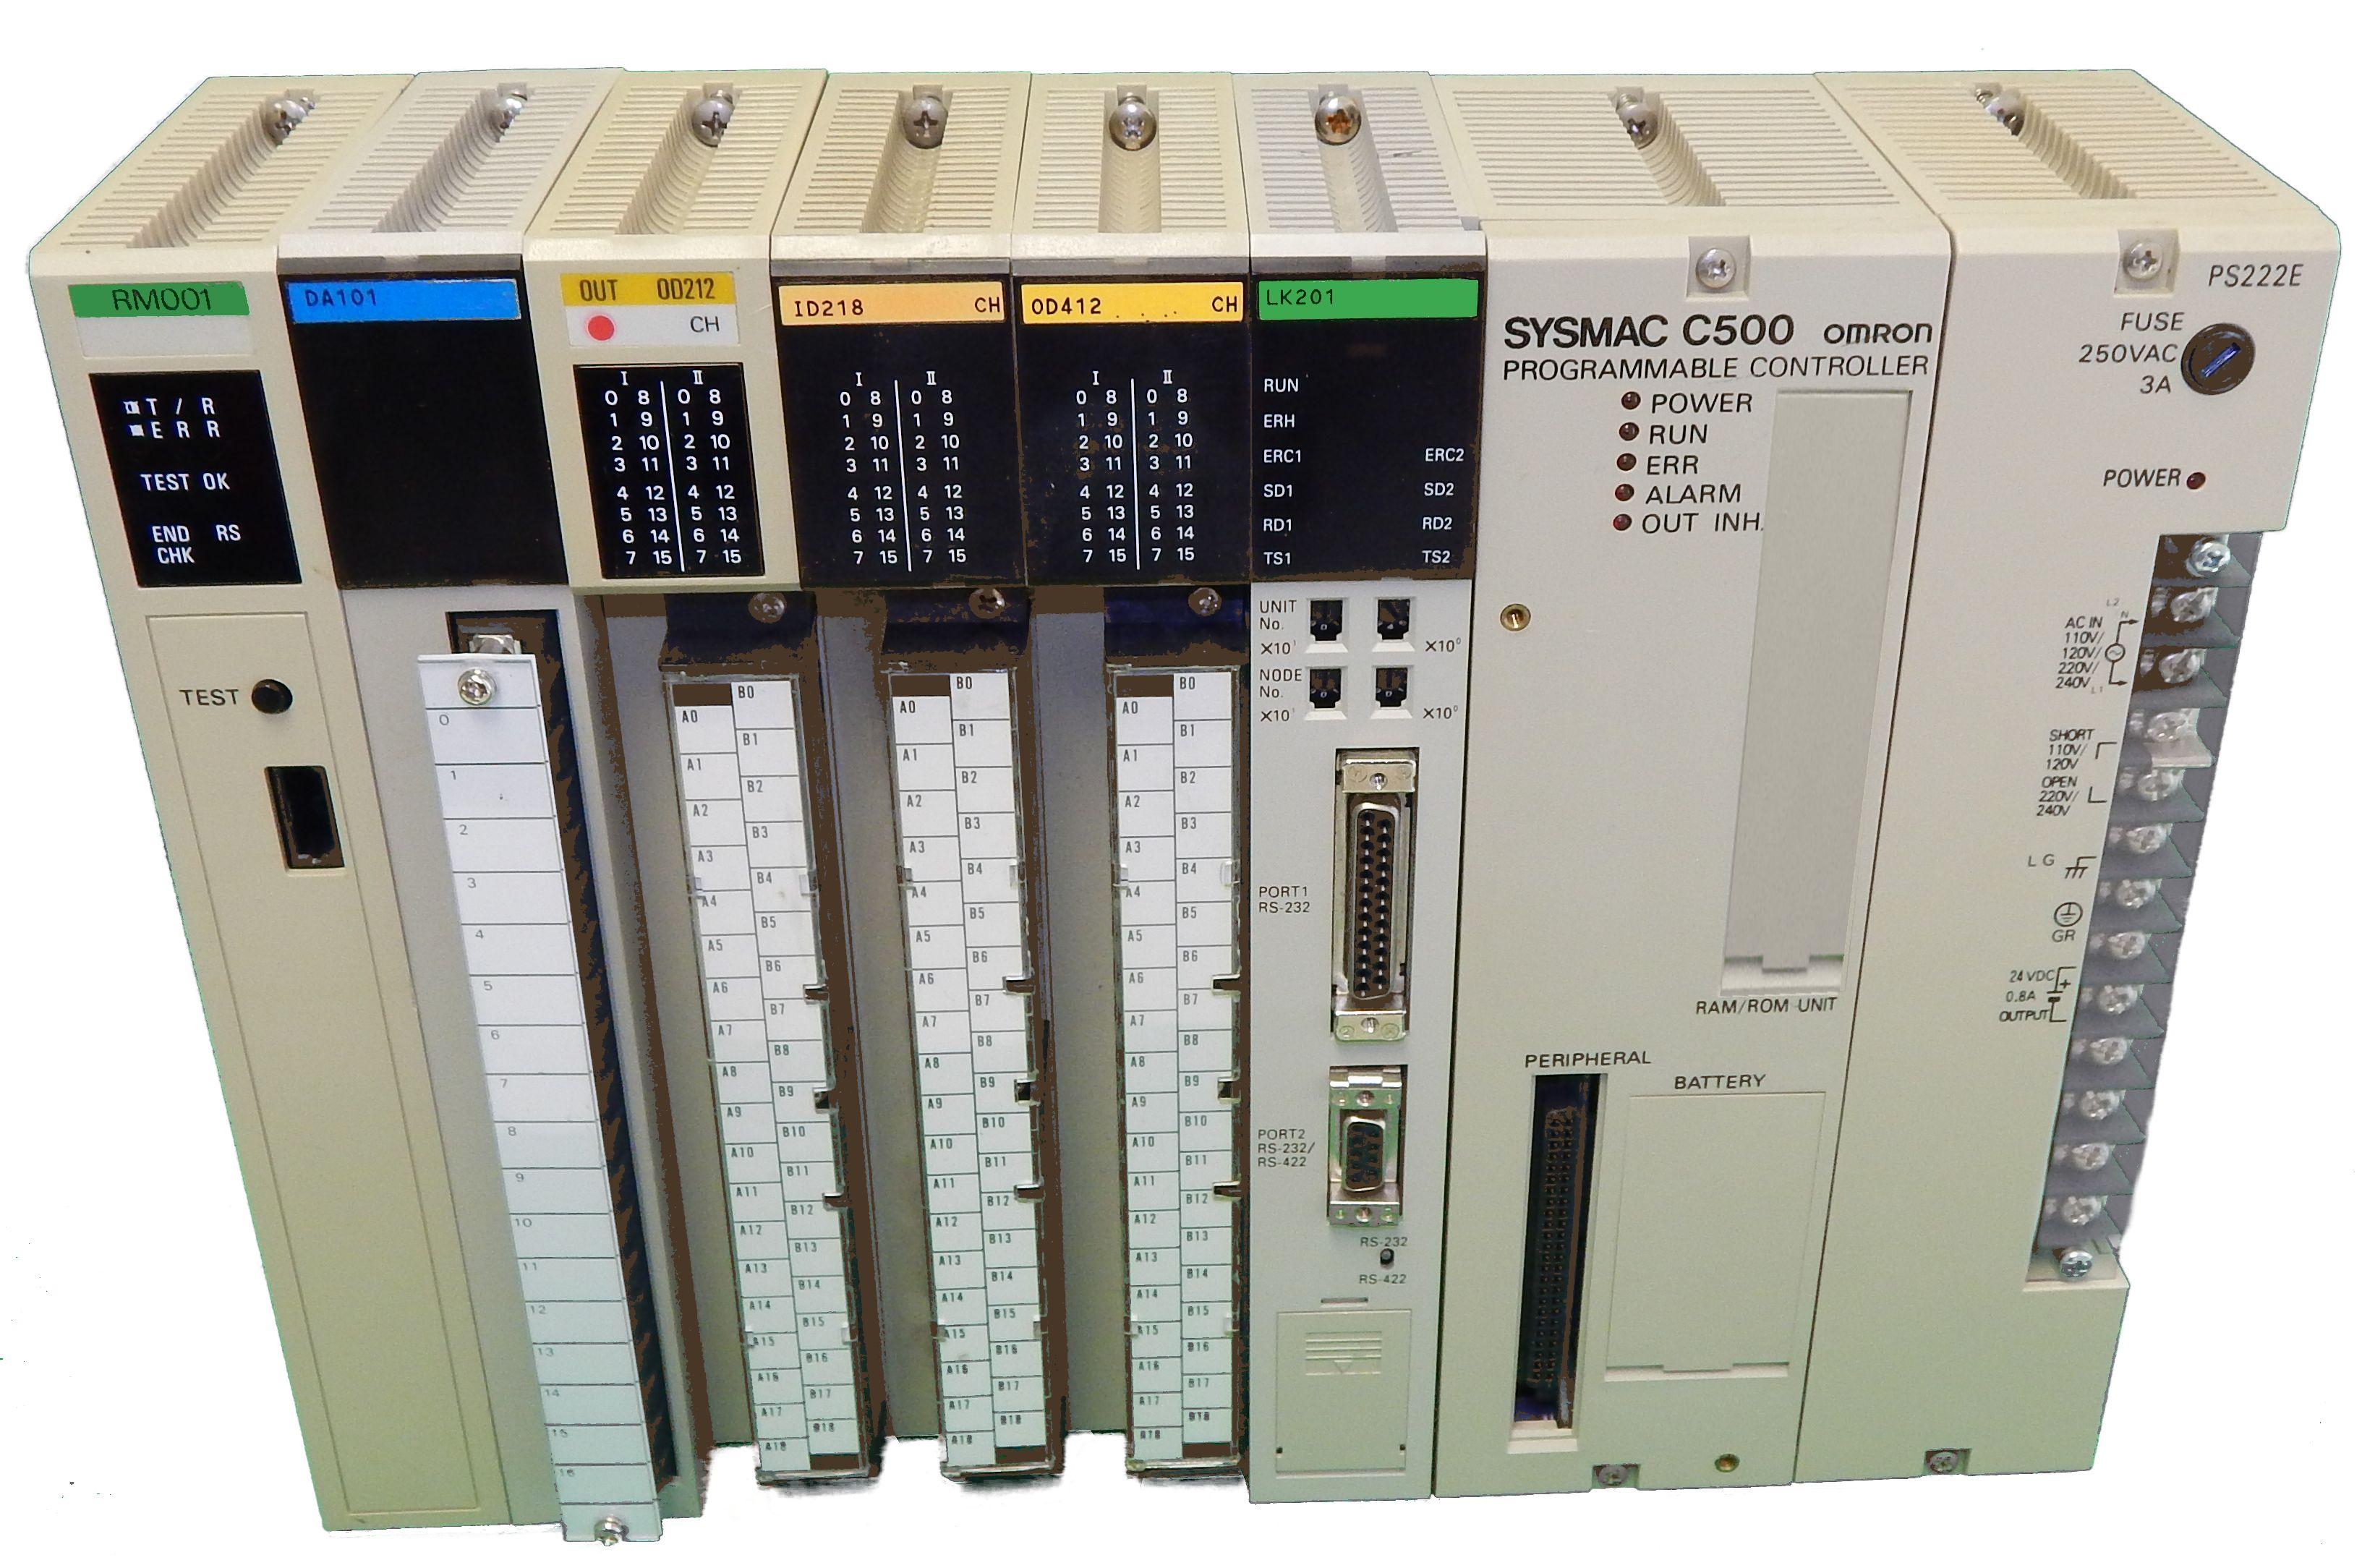 3G2C7-MC228